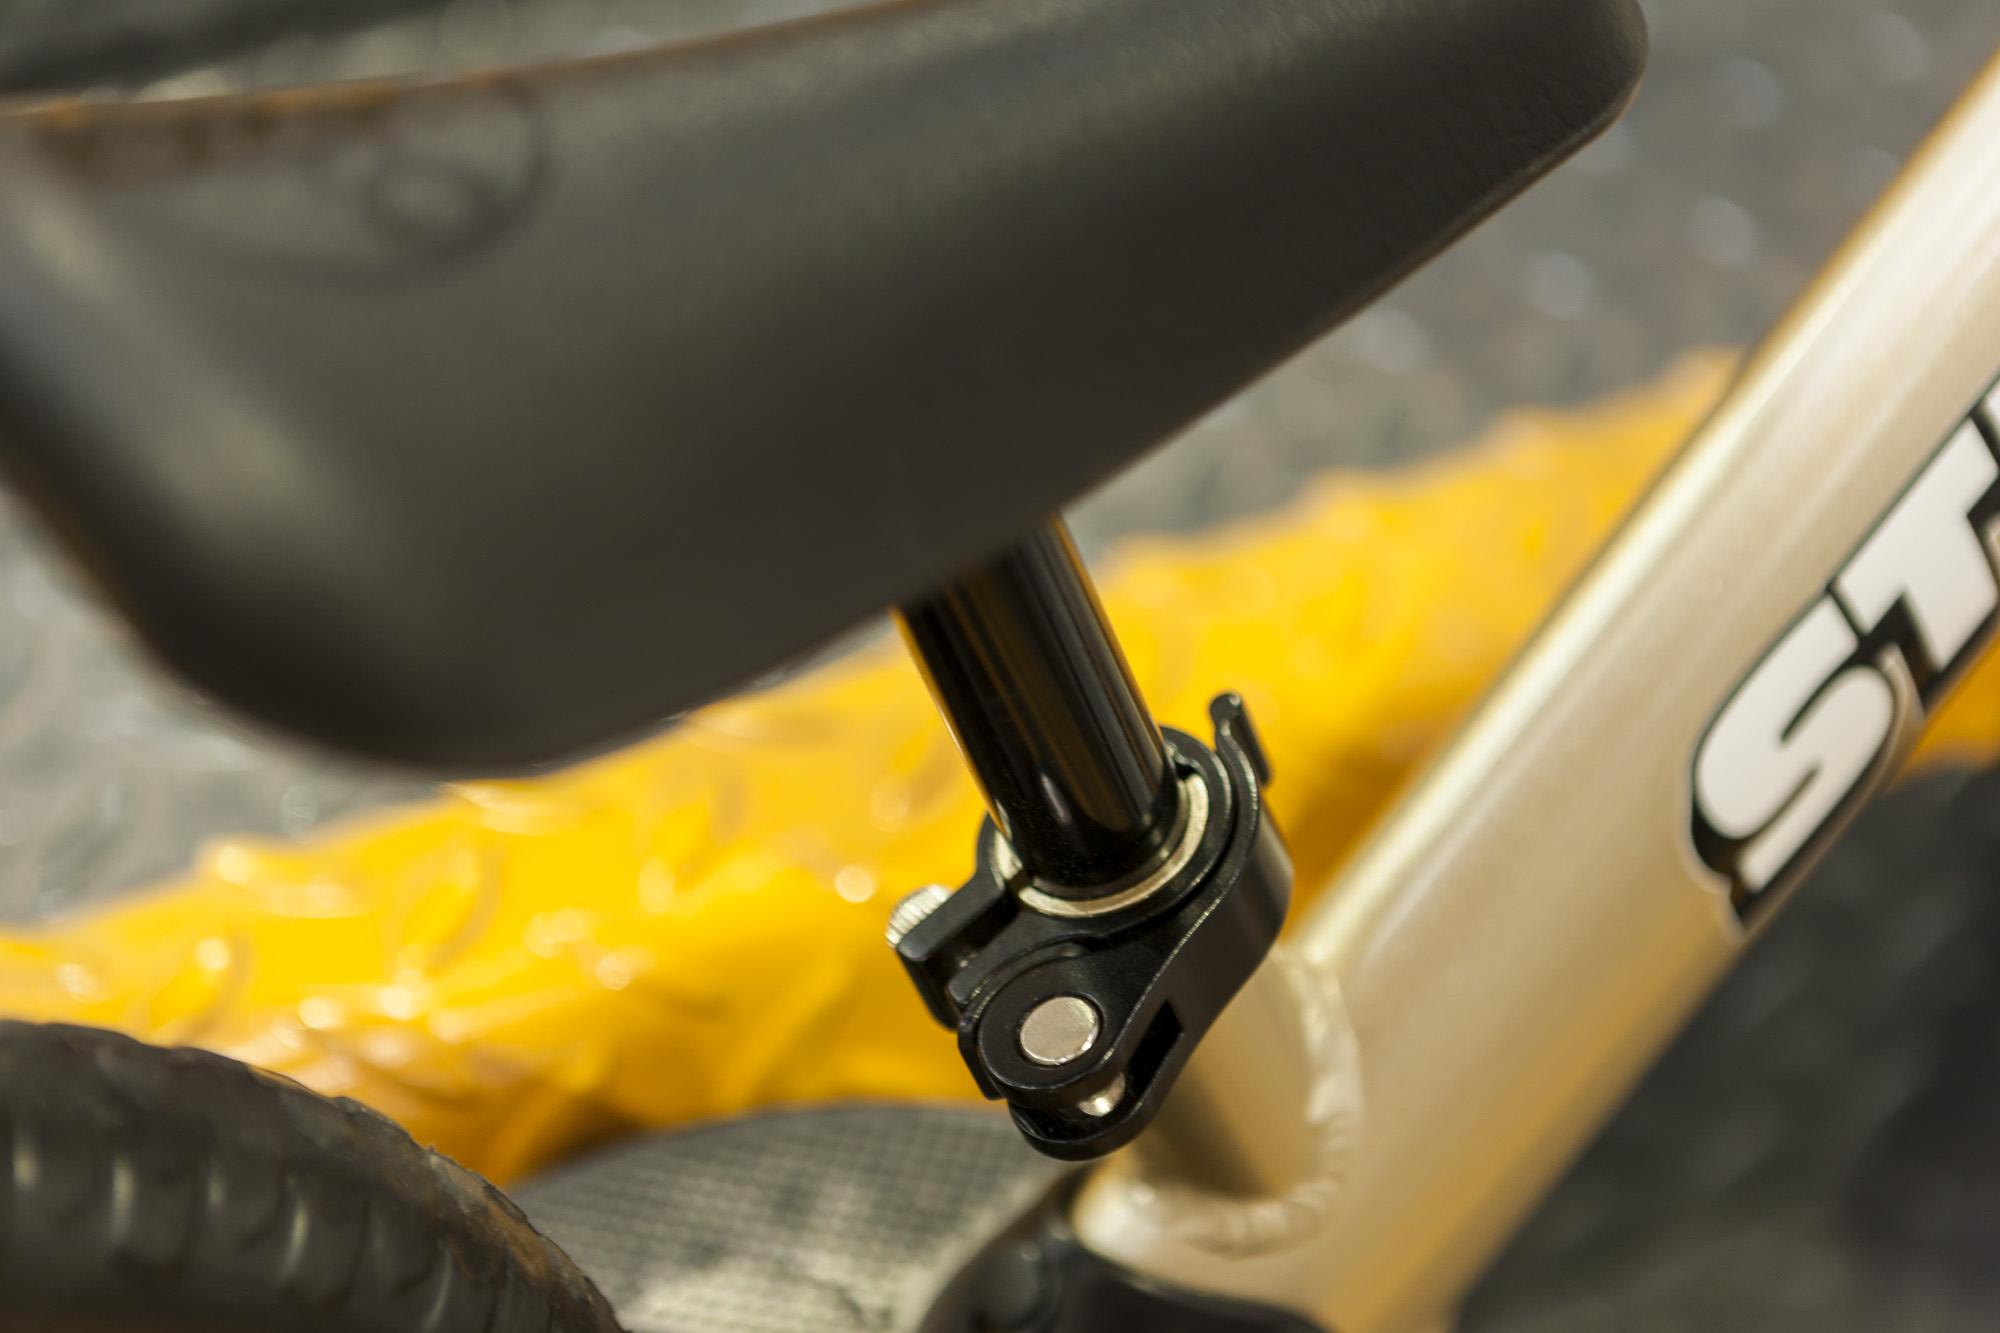 ff1608d00b97 Strider Pro 12 balance bike review - MBR